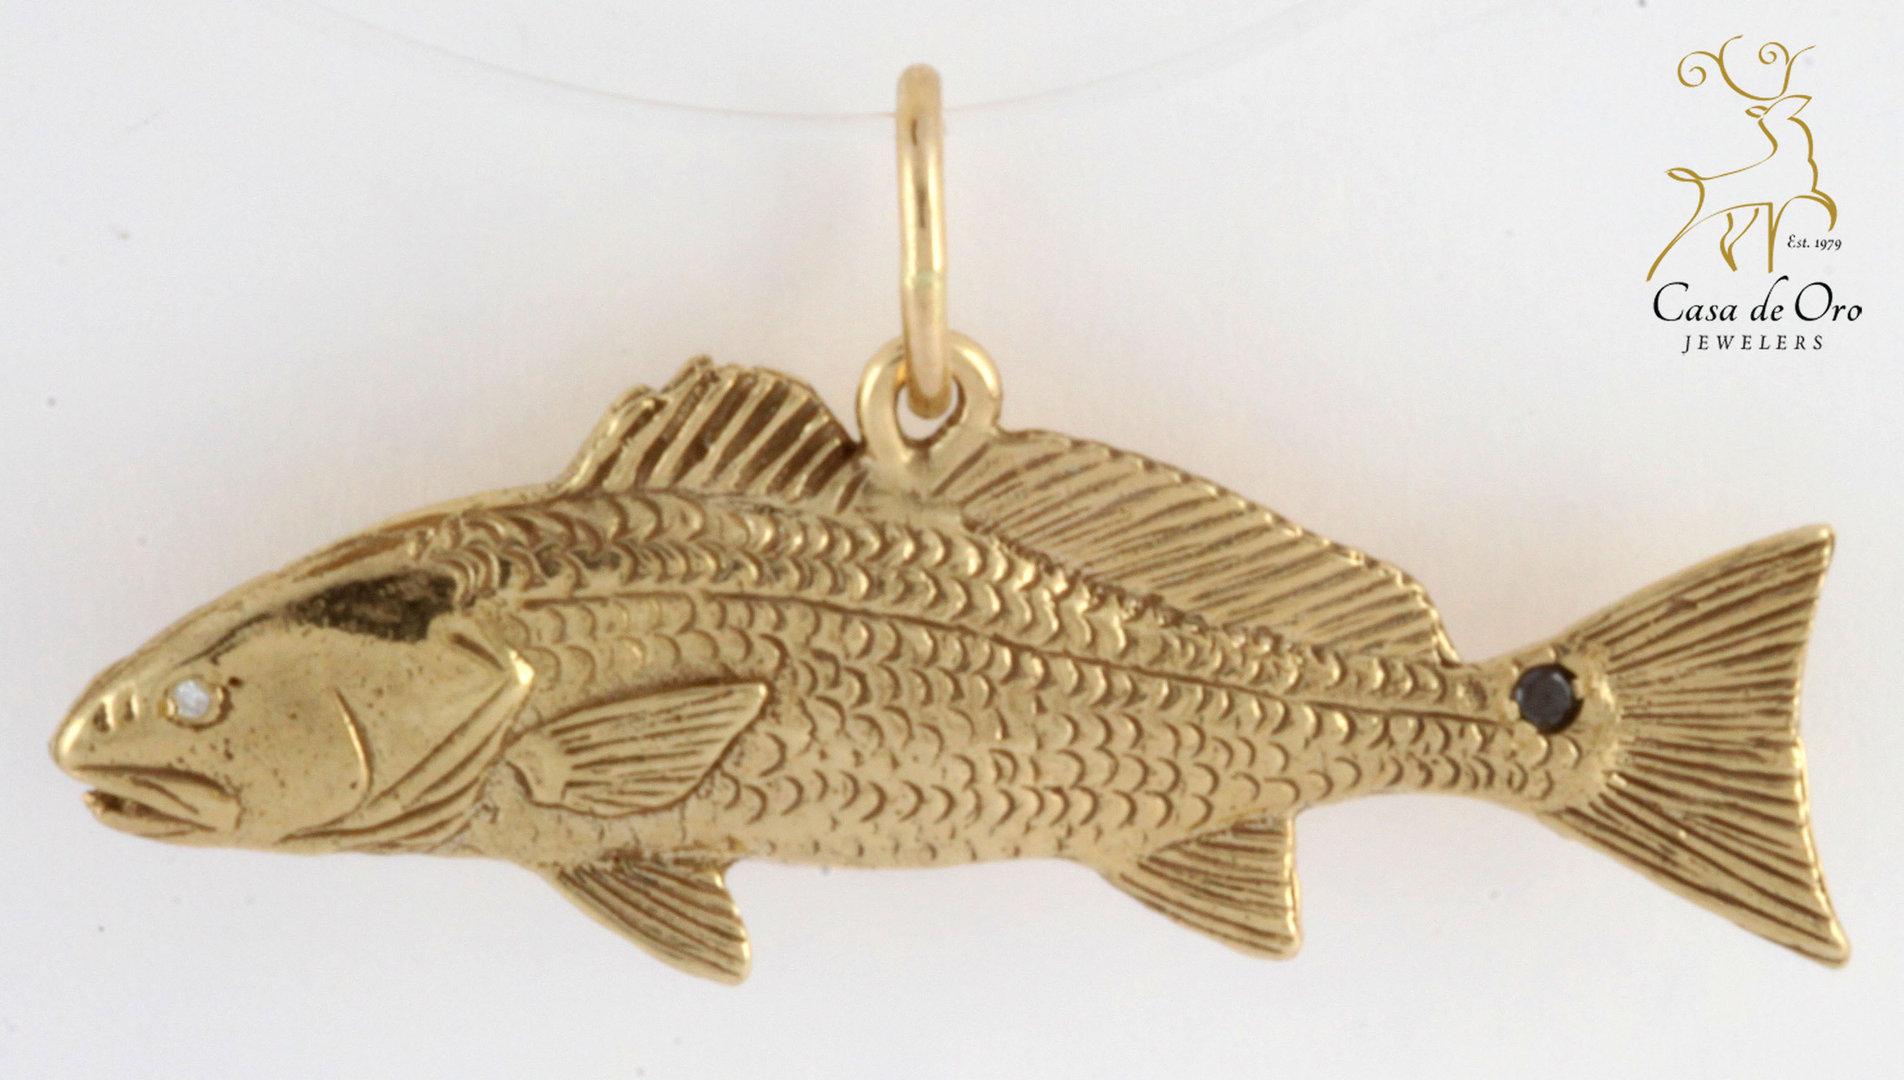 Redfish Pendant W Black Spinel 14ky Casa De Oro Jewelers